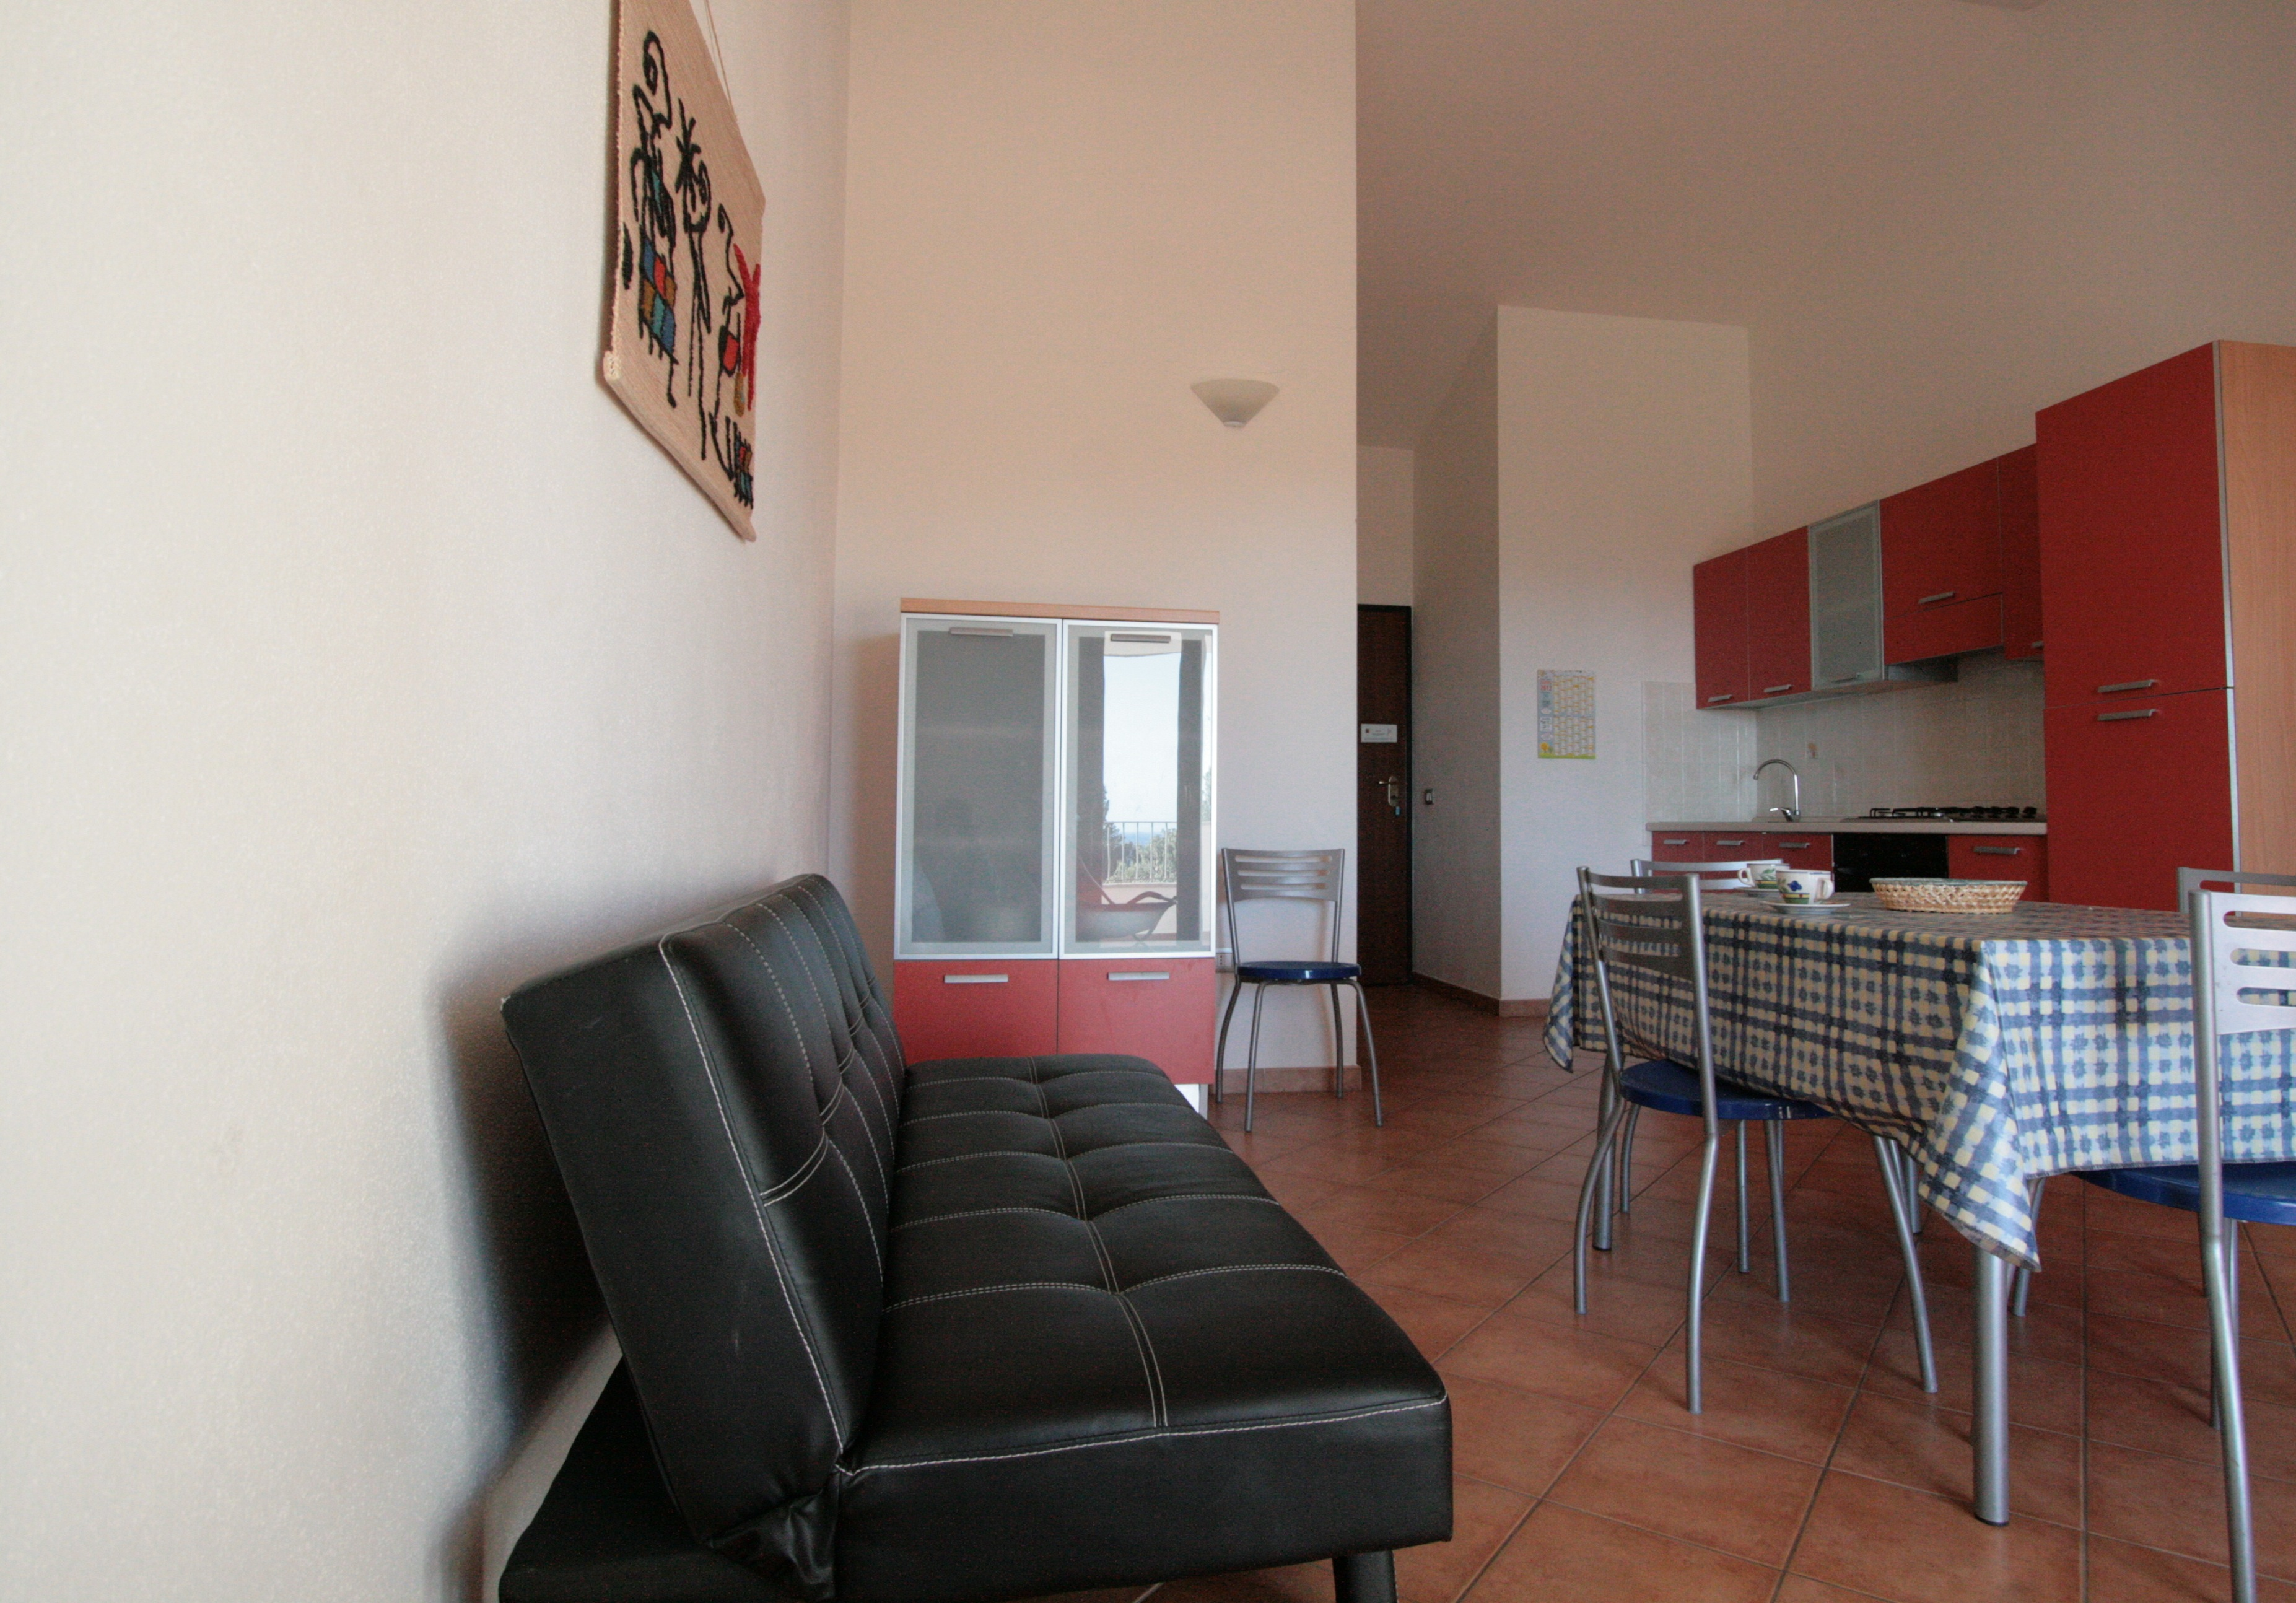 Flat-holidays Stella Marina located in Cala Gonone